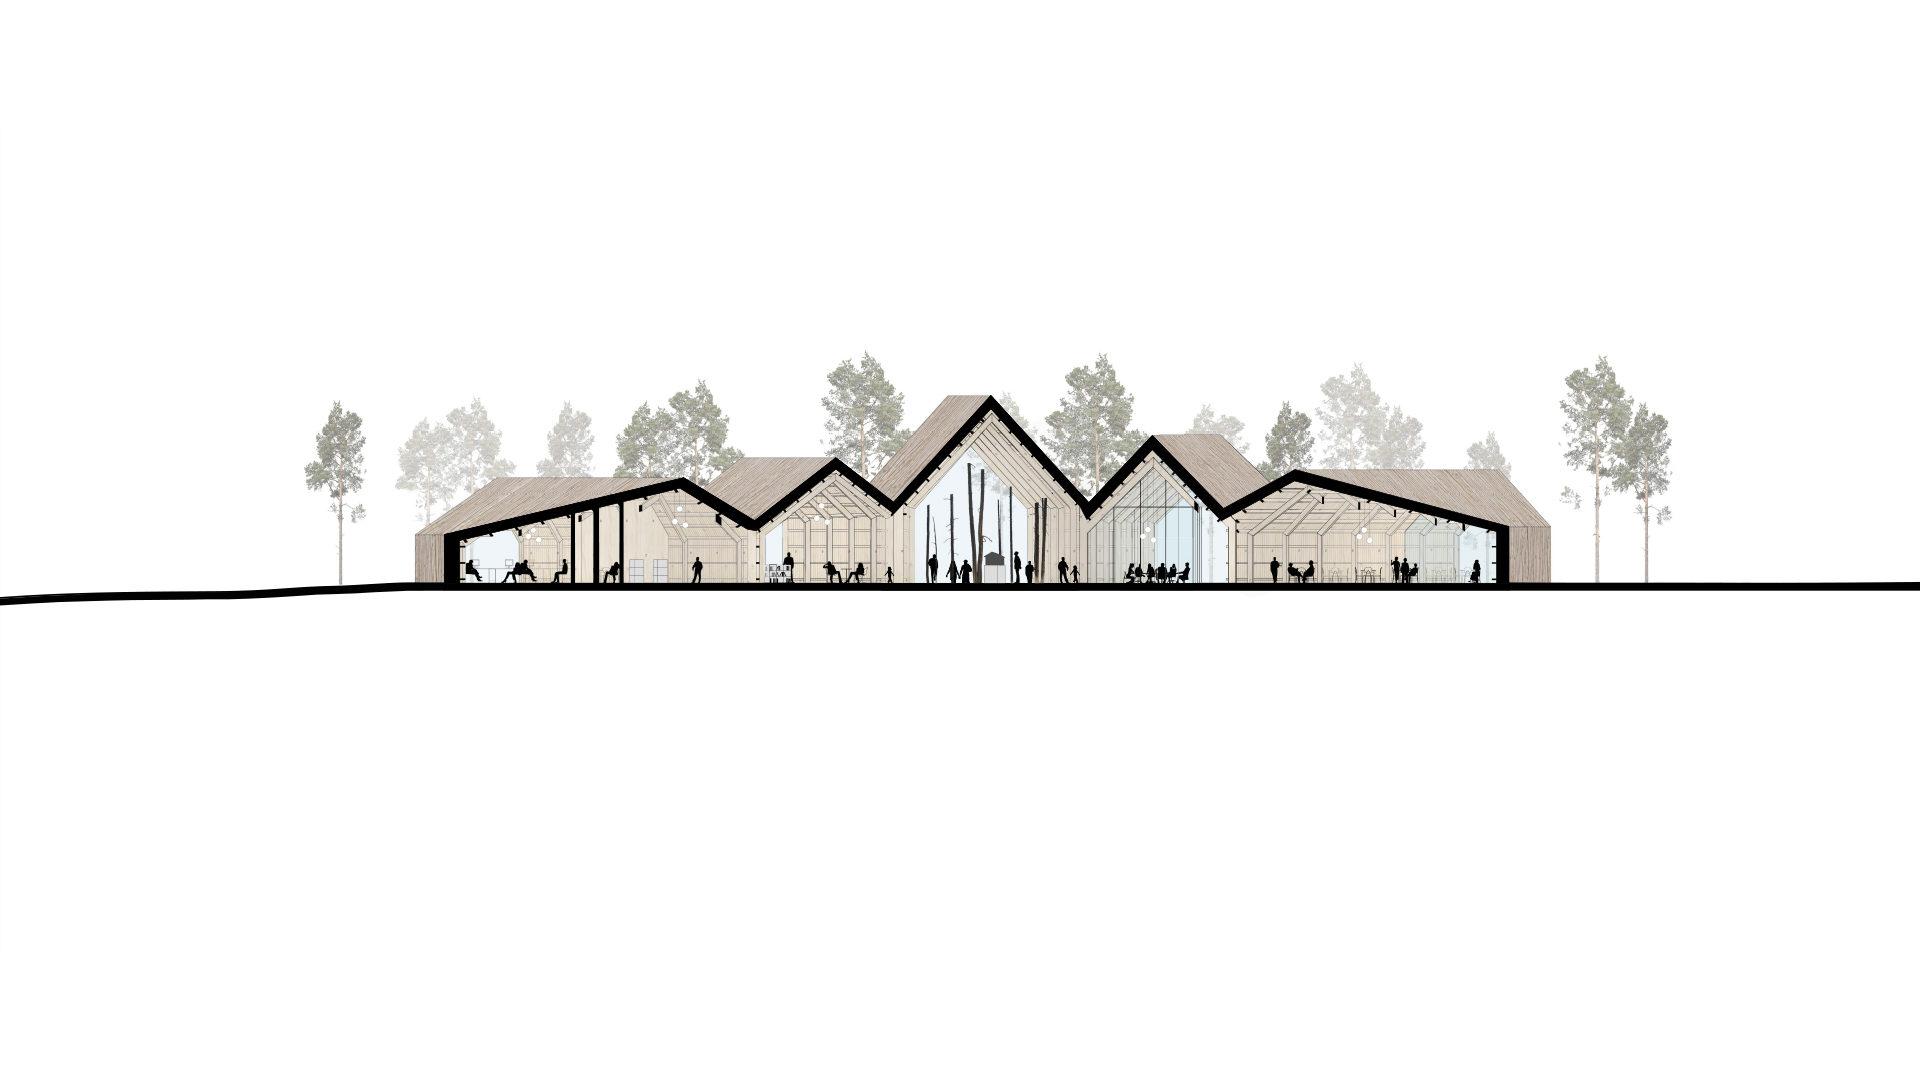 contextual design architecture